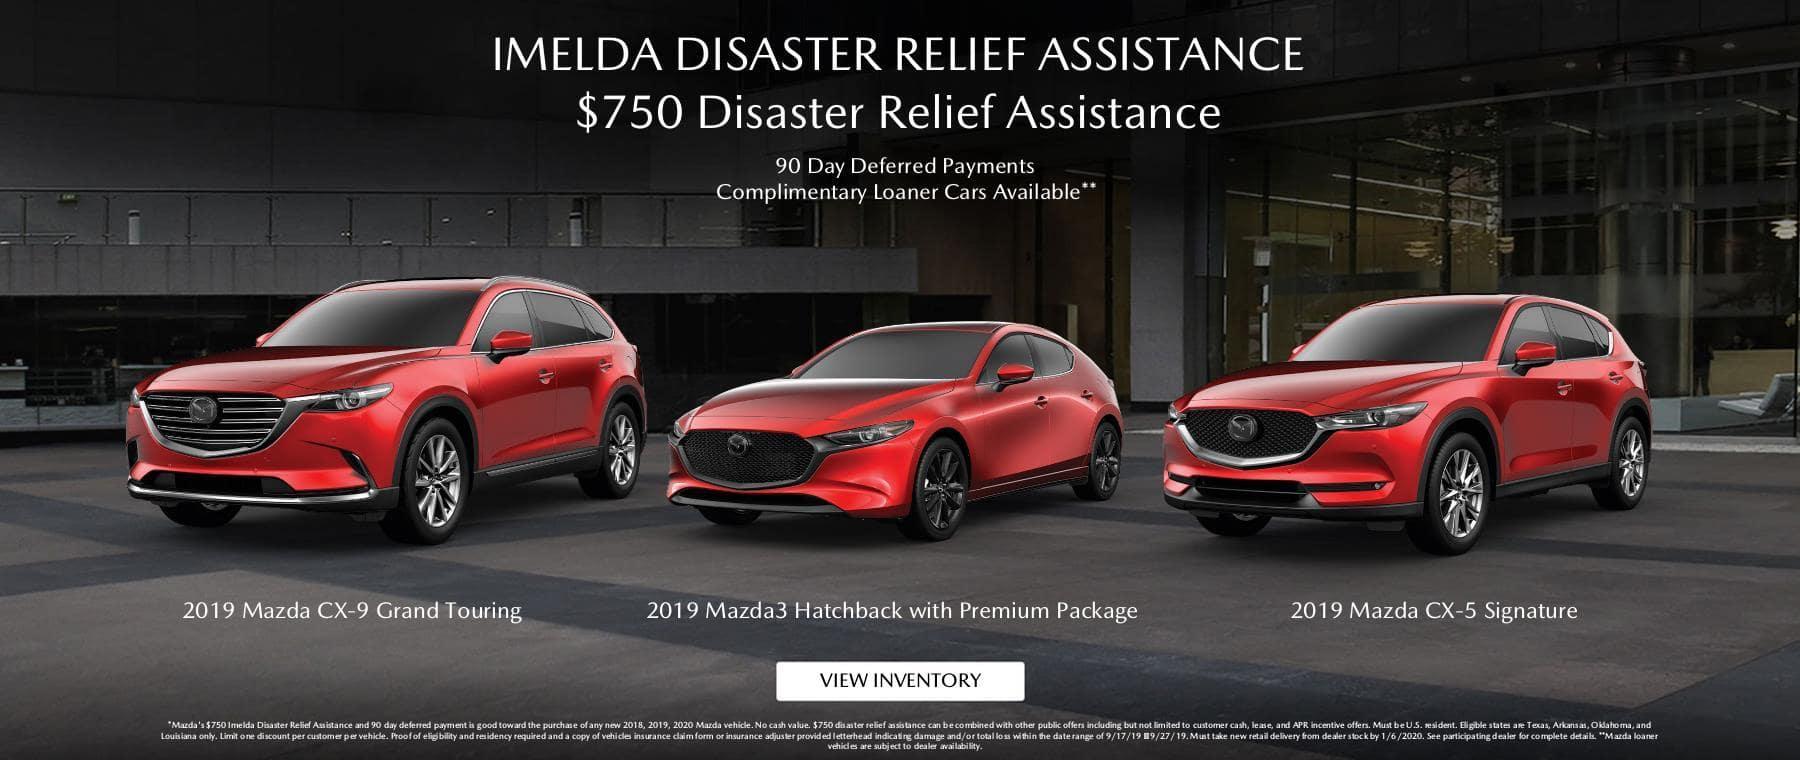 Imeleda-Disaster-Relief-Assistance